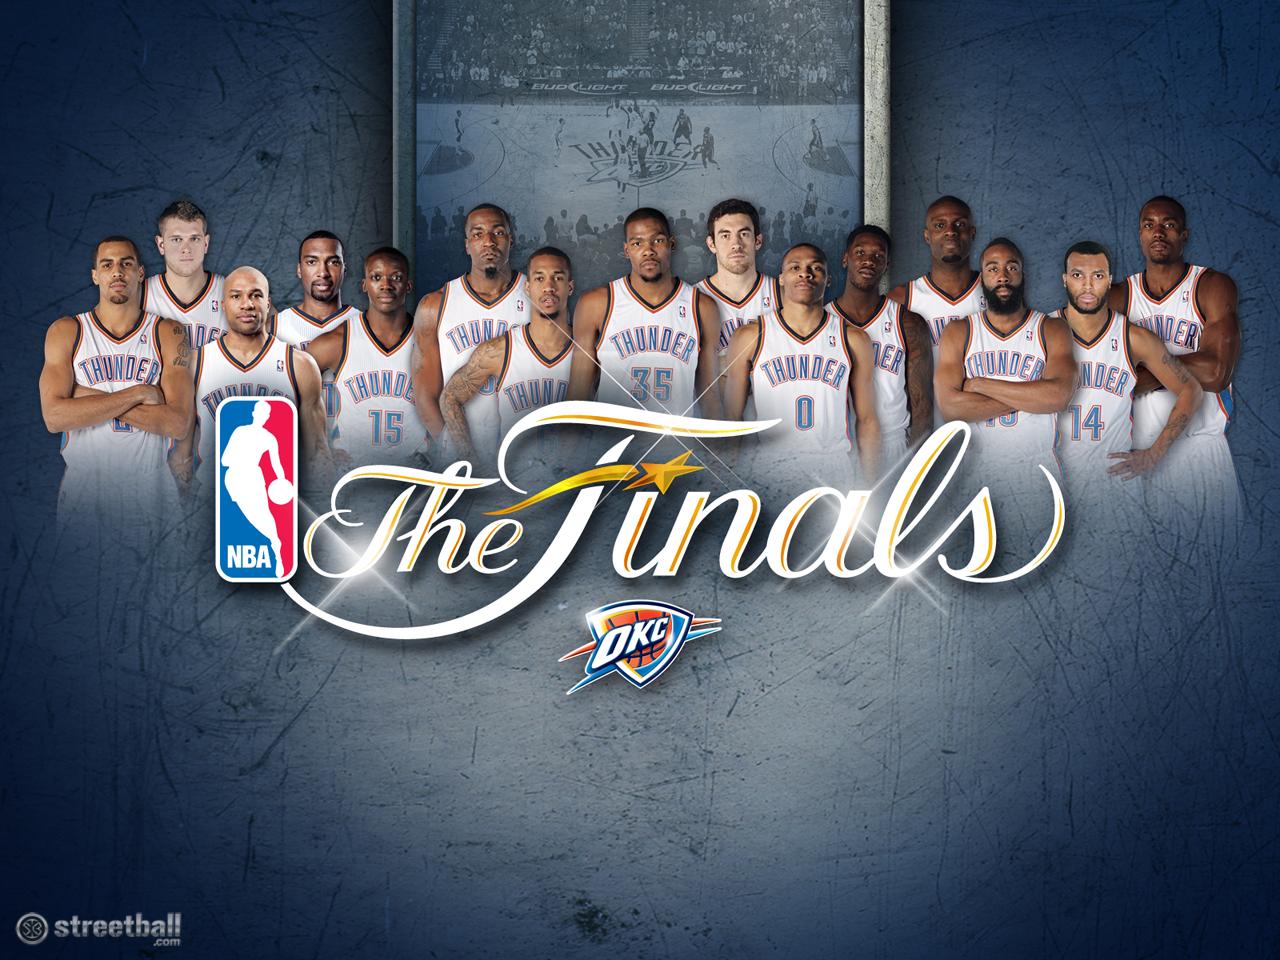 http://4.bp.blogspot.com/-nzTCnyUnBE4/T-bPUm85AeI/AAAAAAAADOA/GWRYJ3YrlWg/s1600/Oklahoma_City_Thunder_NBA_Finals_Team_Wallpaper_2012.png